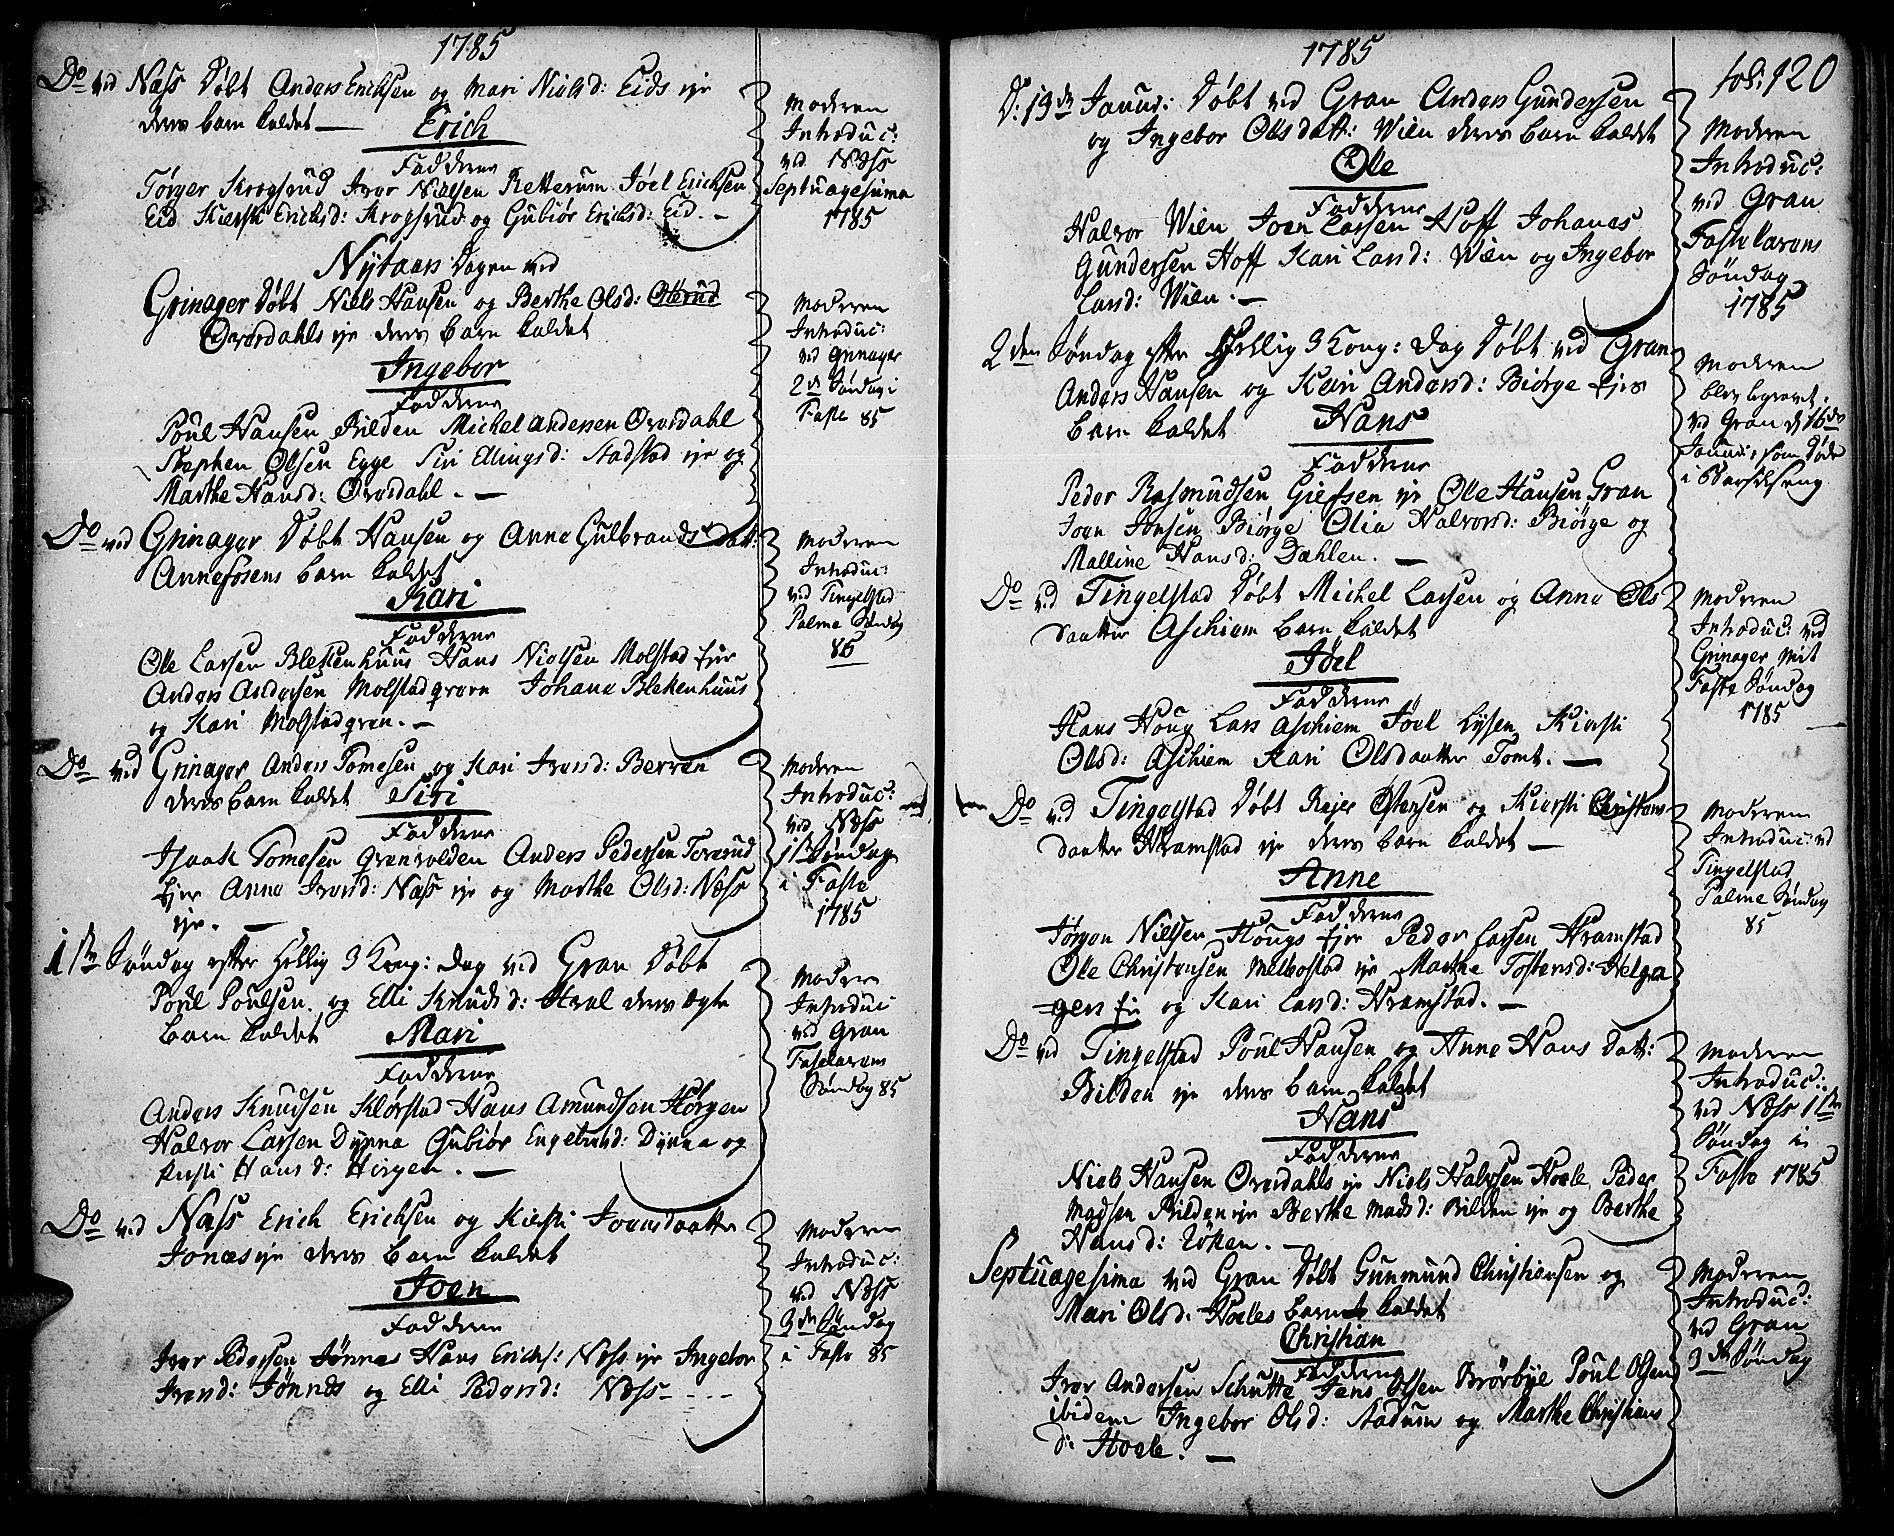 SAH, Gran prestekontor, Ministerialbok nr. 5, 1776-1788, s. 120